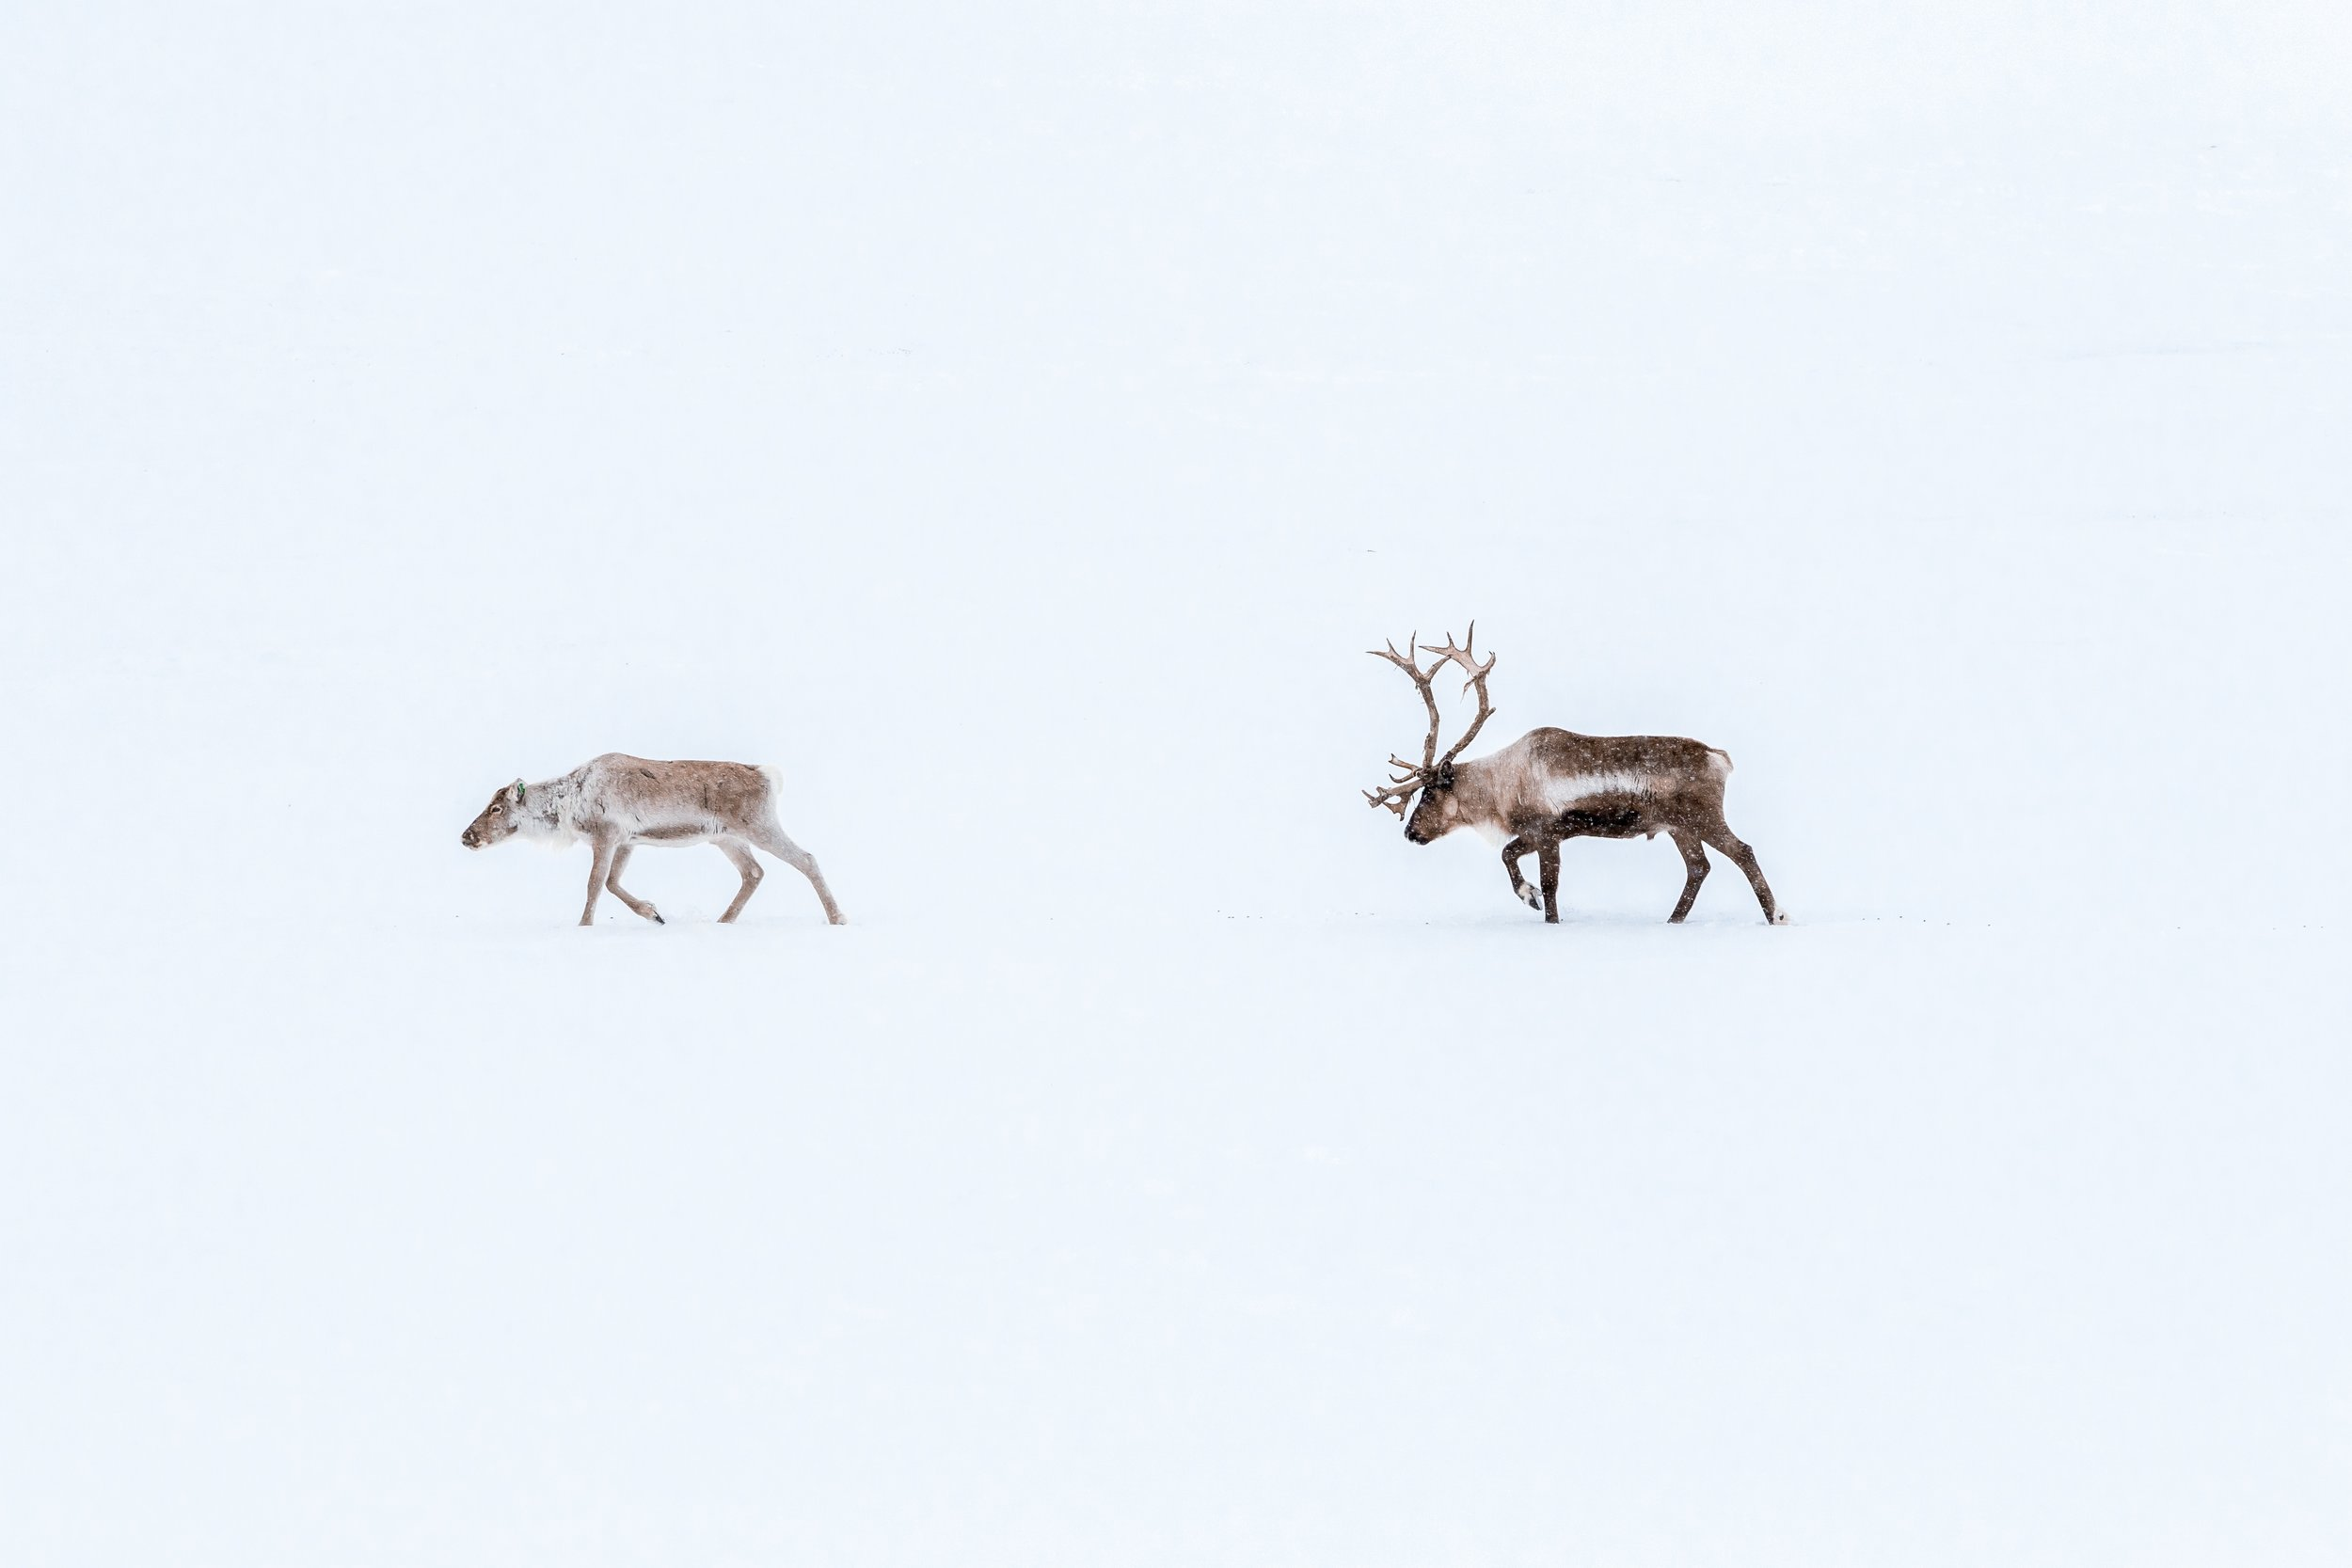 Reindeer in the wild. Photo: Marcus Löfvenberg